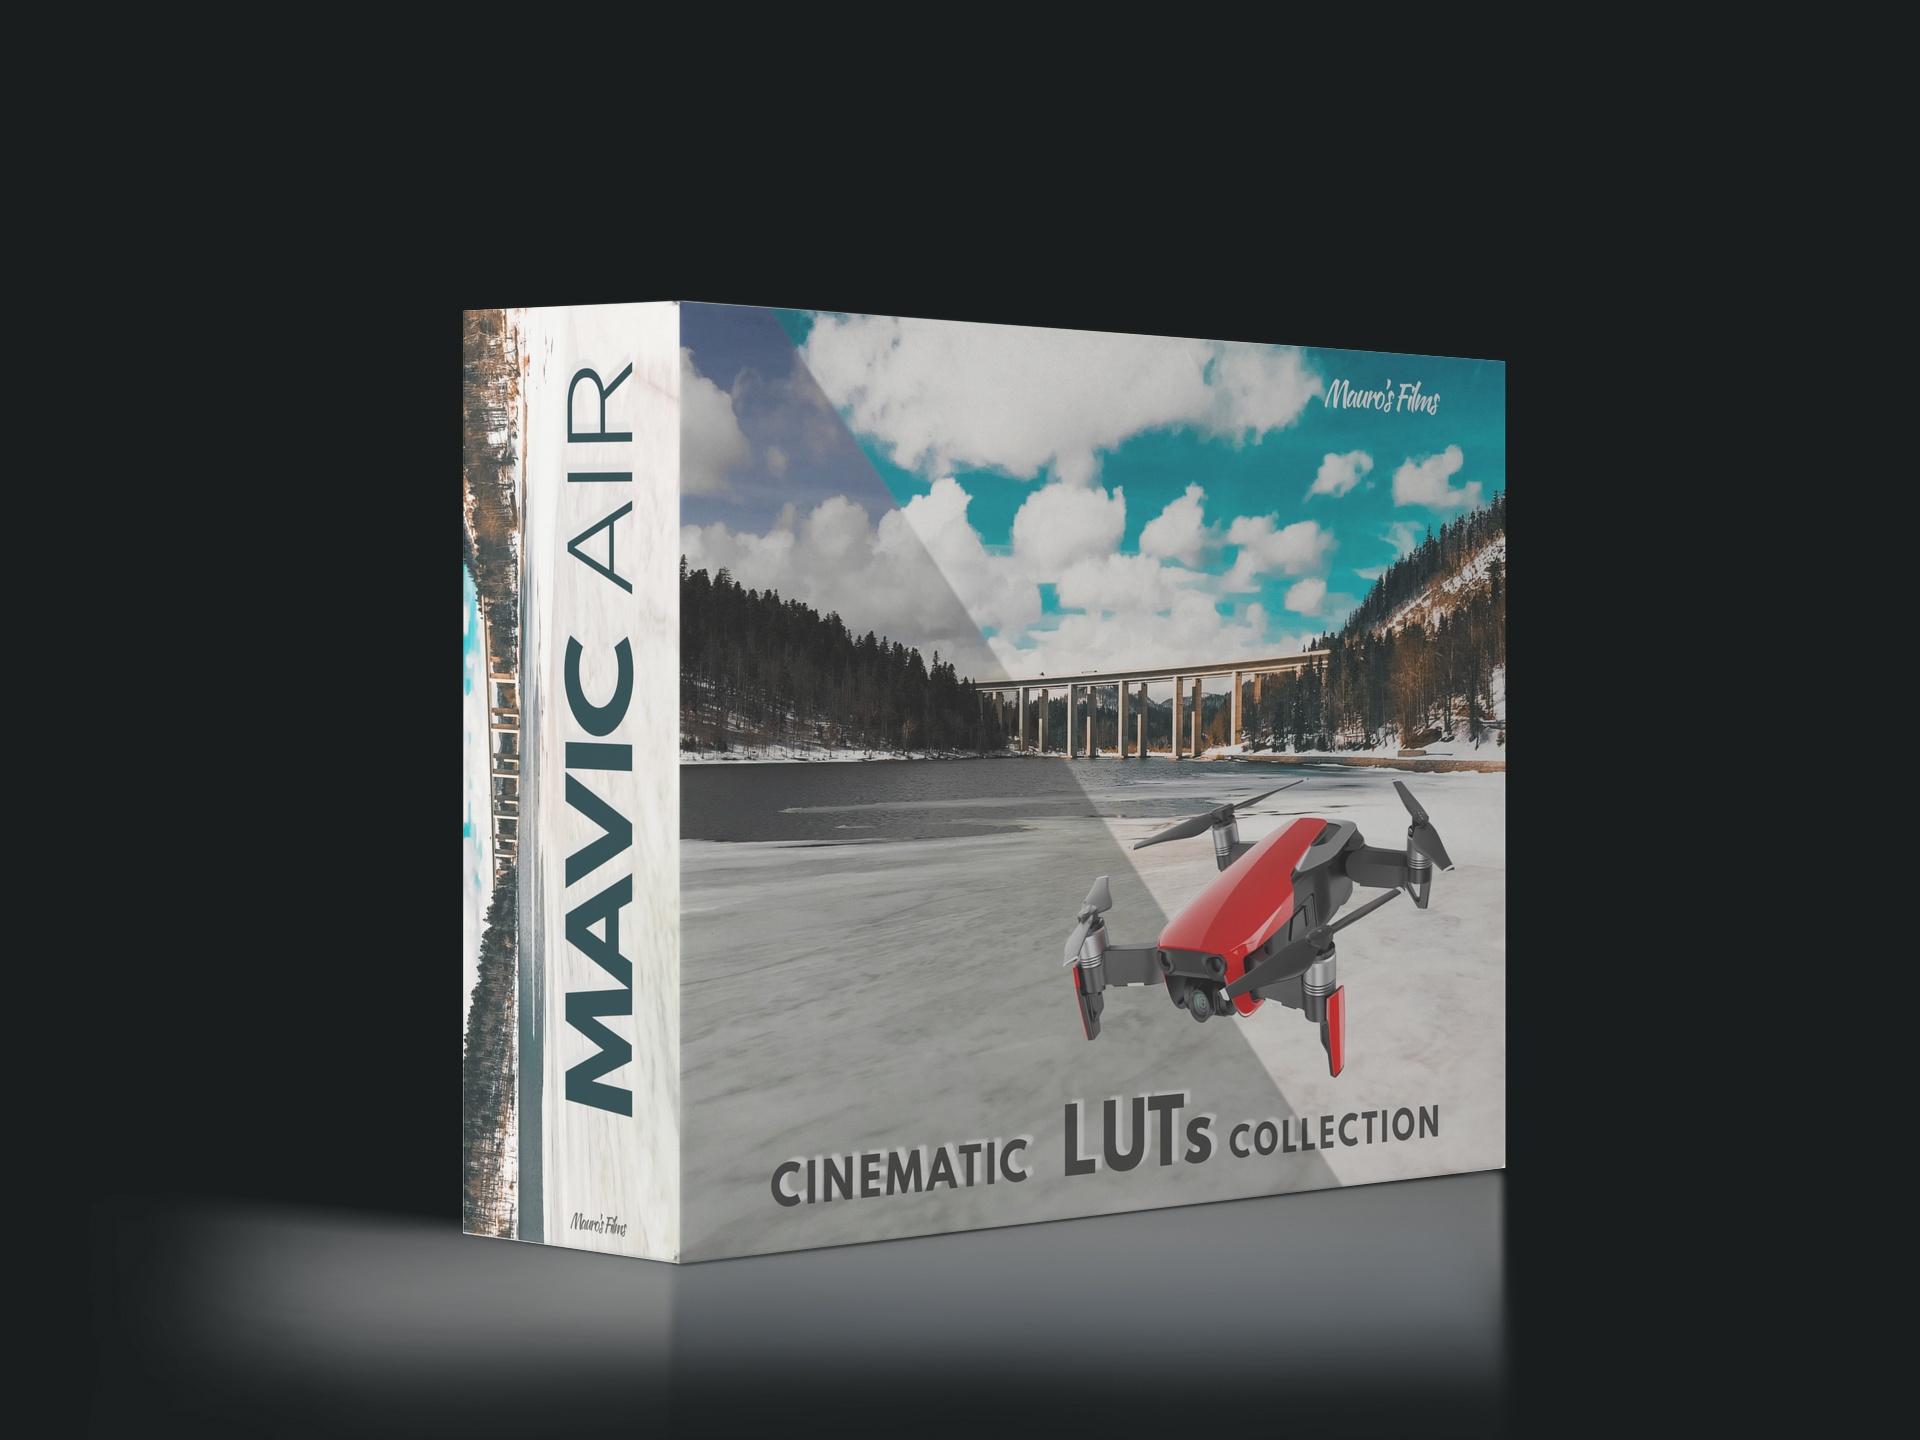 DJI MAVIC AIR CINEMA COAST COLLECTION by Mauro's Films